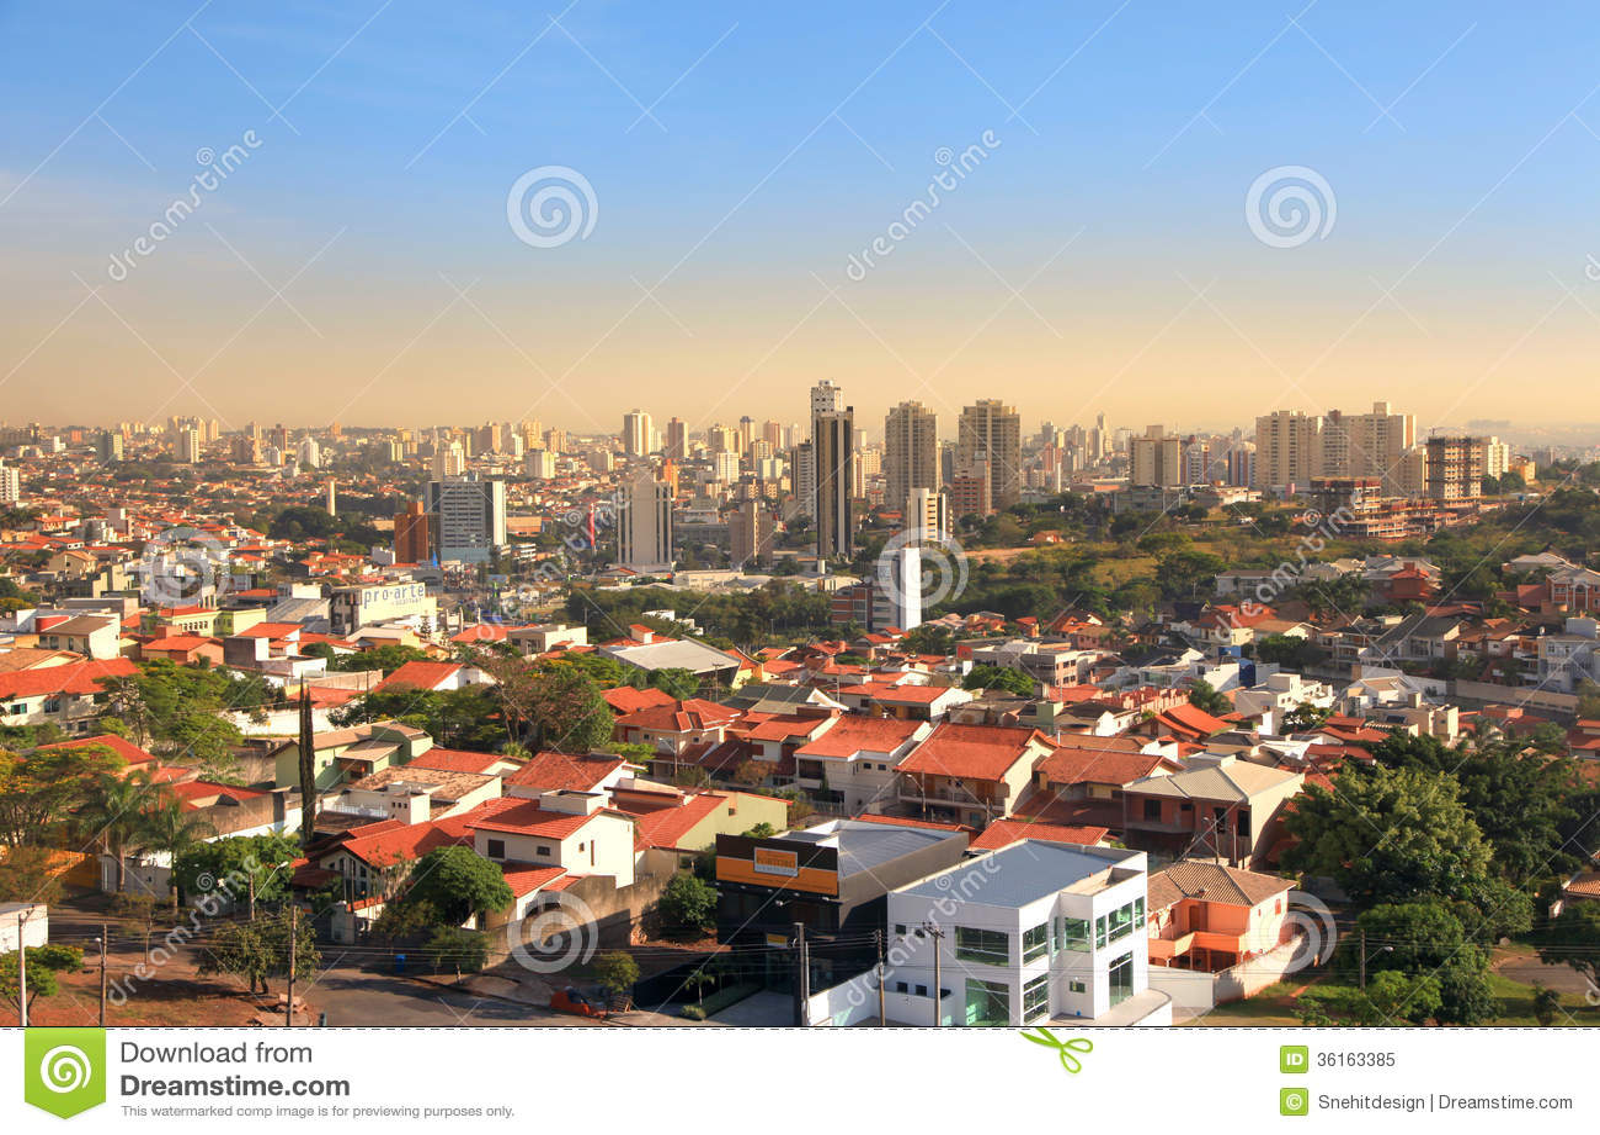 Sorocaba São Paulo fonte: thumbs.dreamstime.com